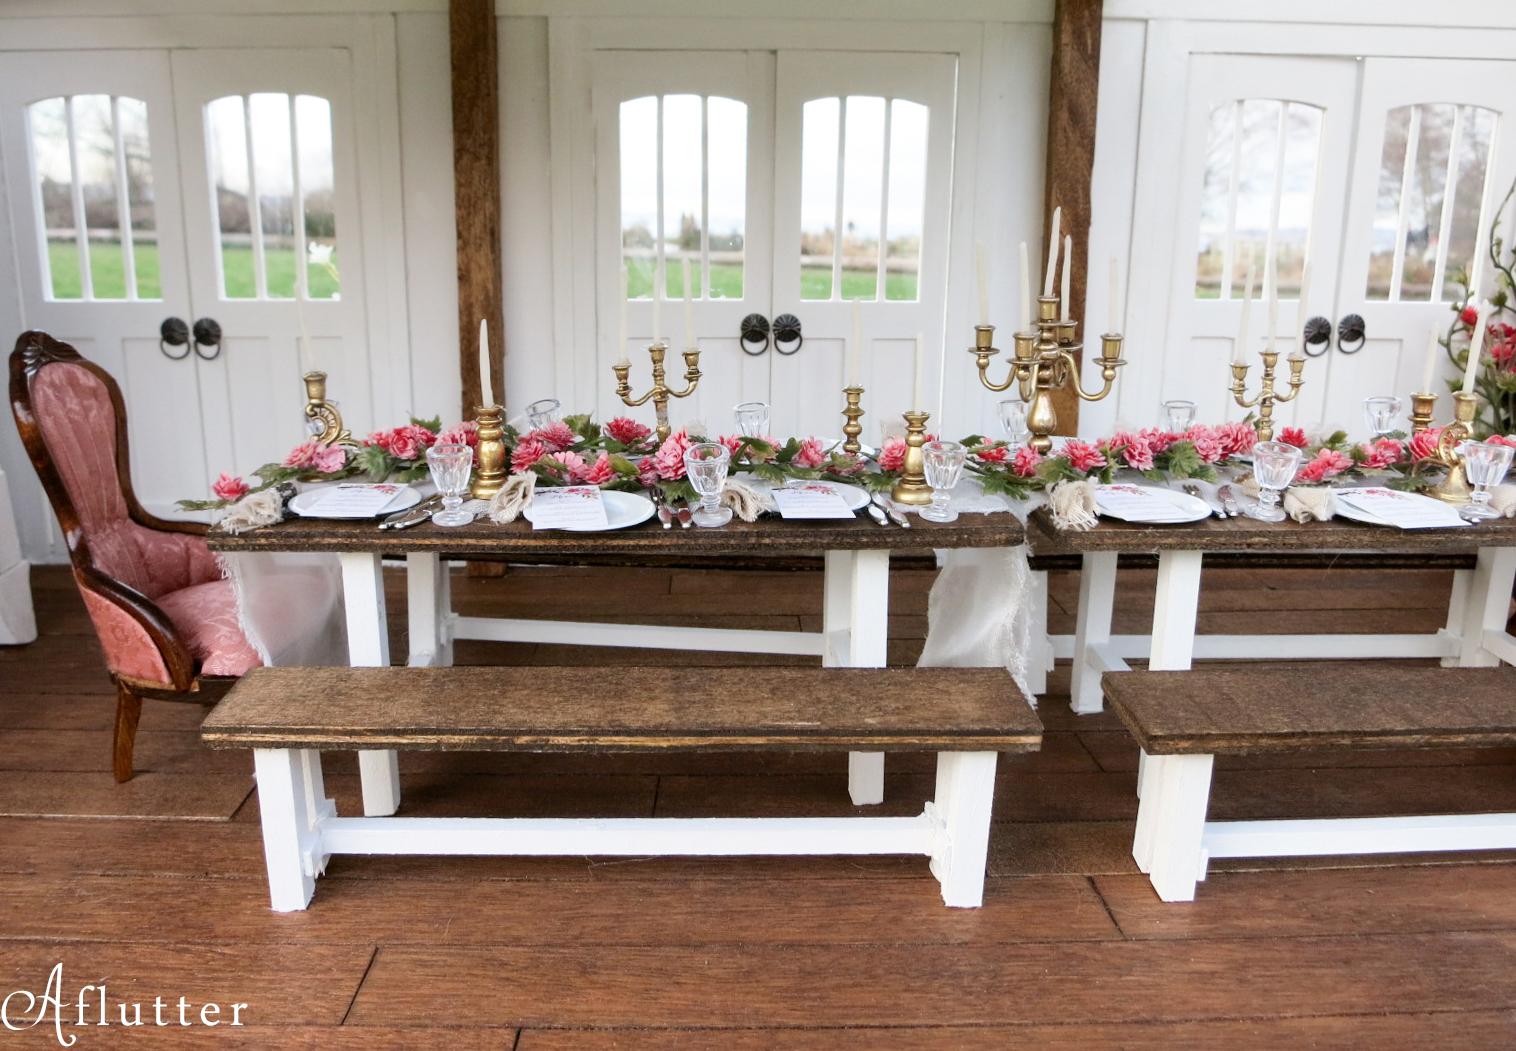 Brenul-Barn-Mini-Wedding-11-of-16.jpg